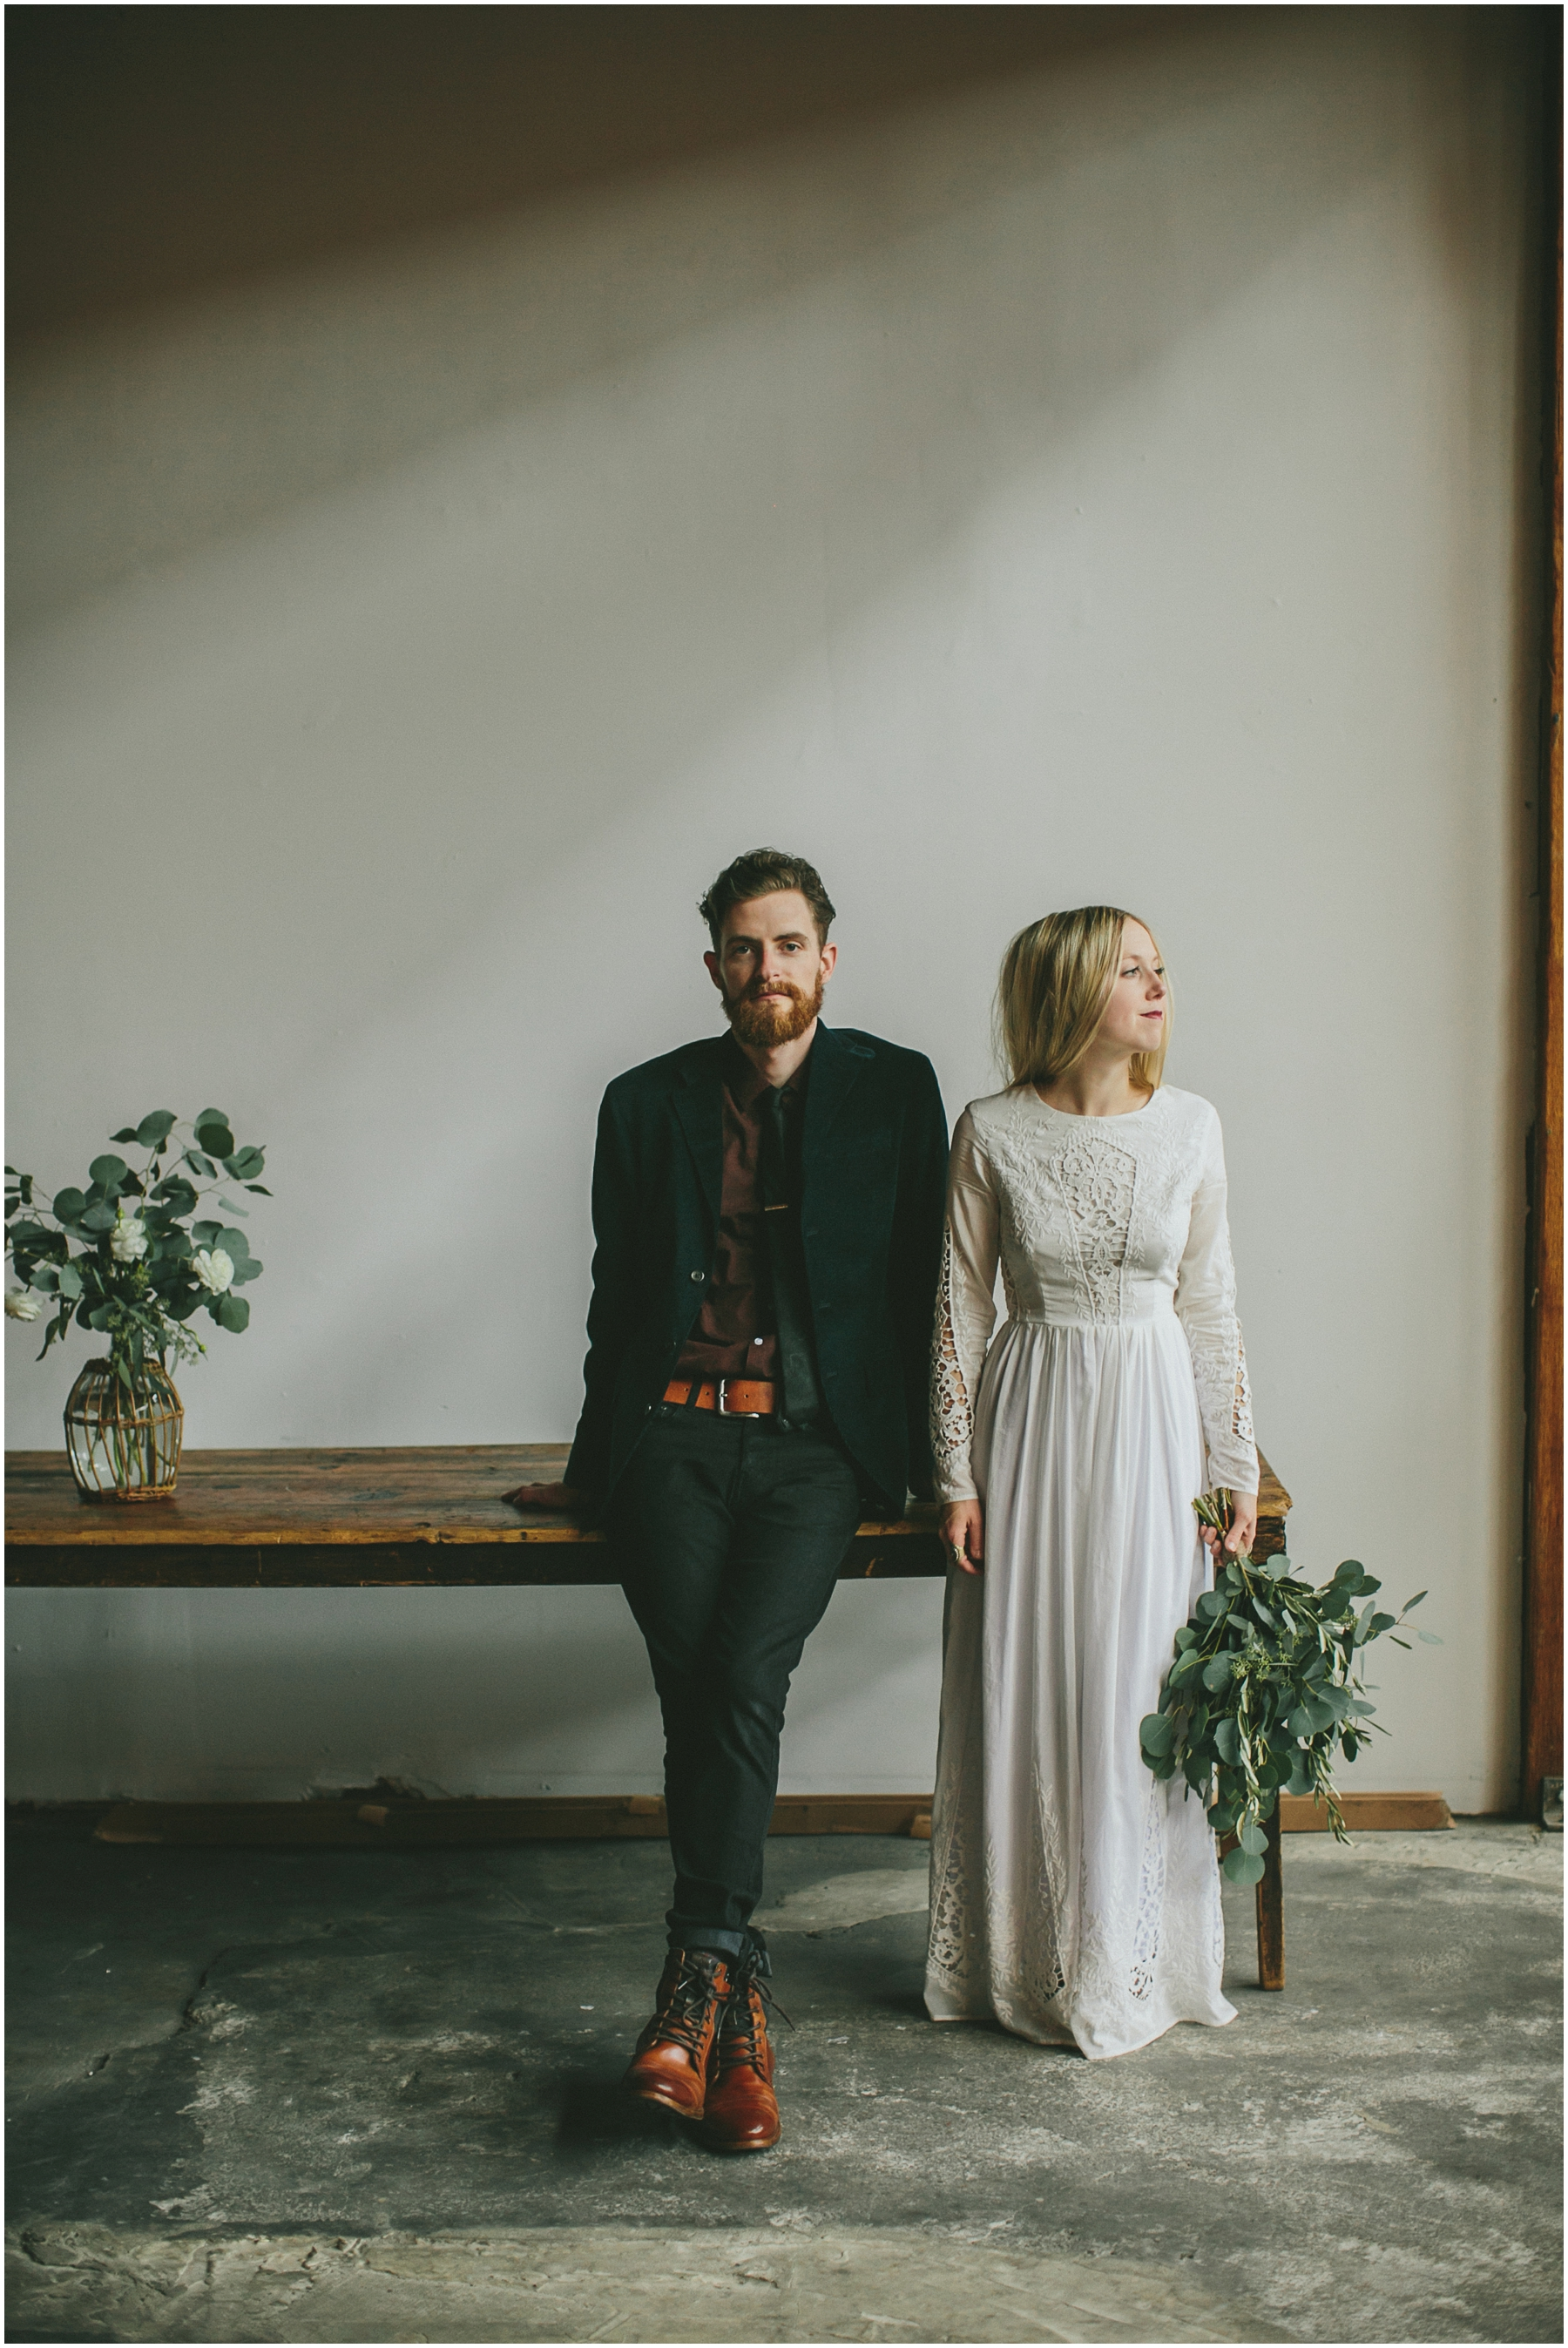 Natalie+Corey-WEDDING_KELLYBOITANO_0043